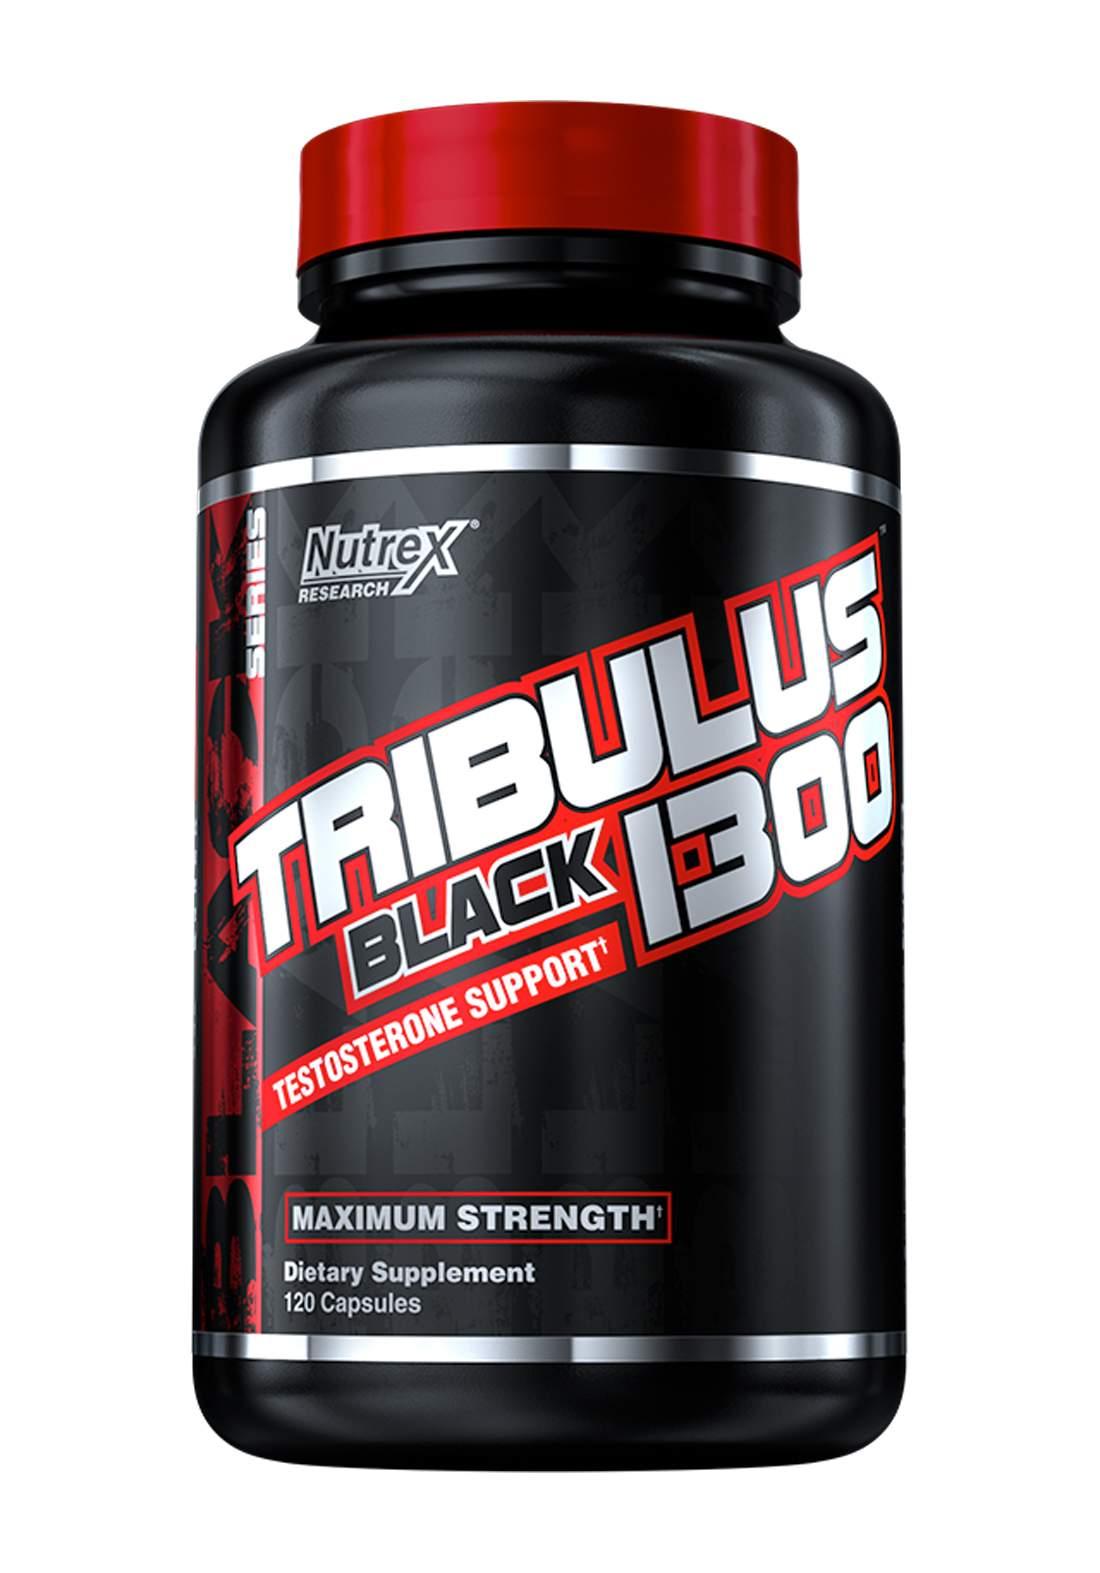 Nutrex Tribulus Black 1300 Testosterone Support 120 capsules مكمل غذائي